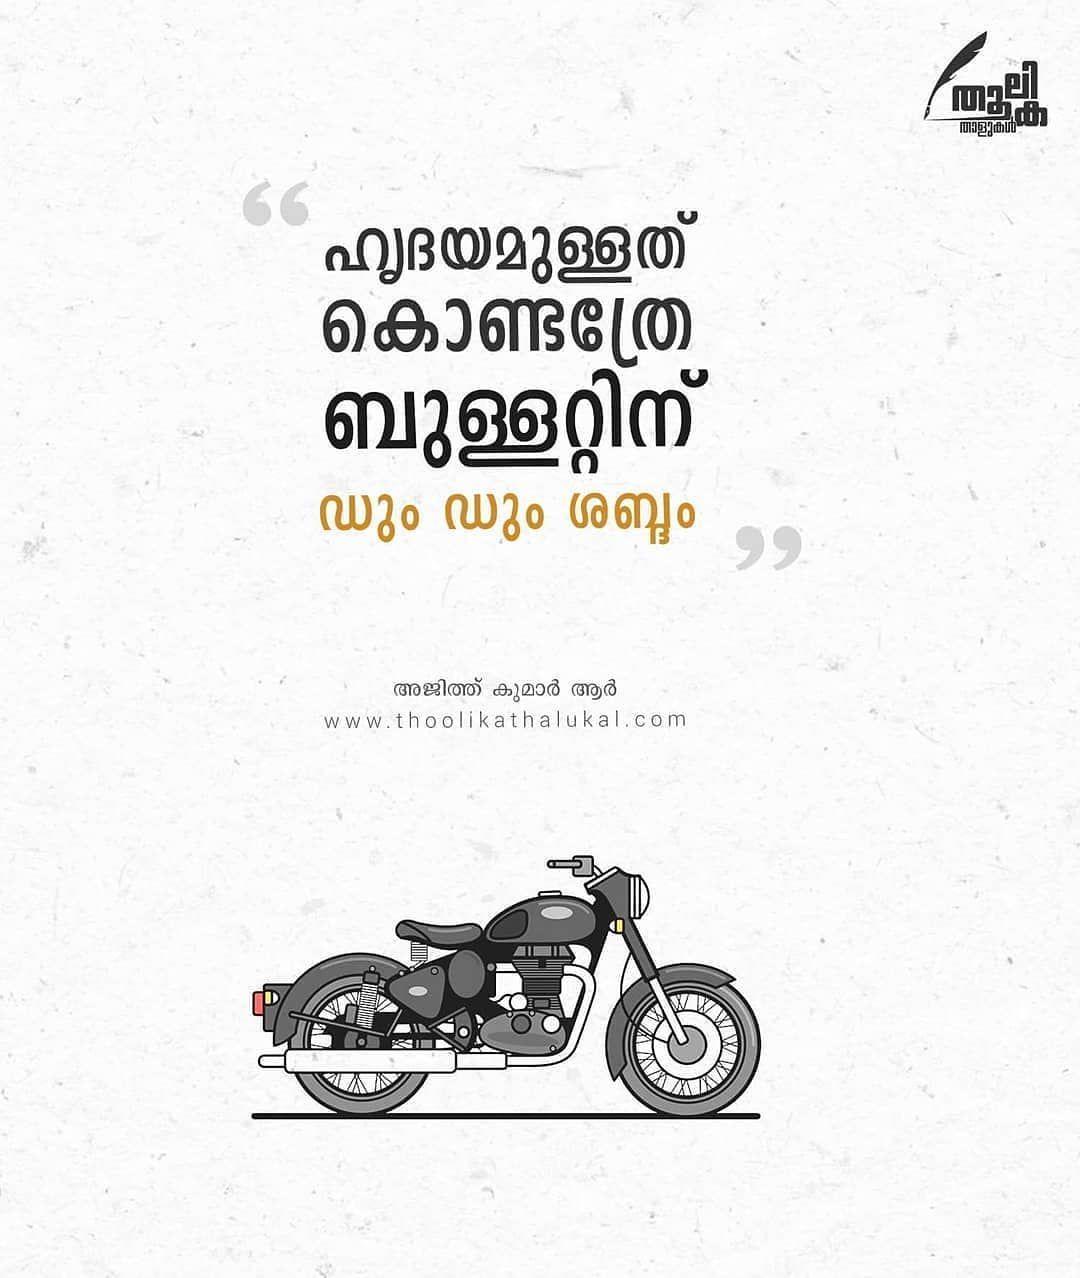 Royal Enfield Quotes In Malayalam